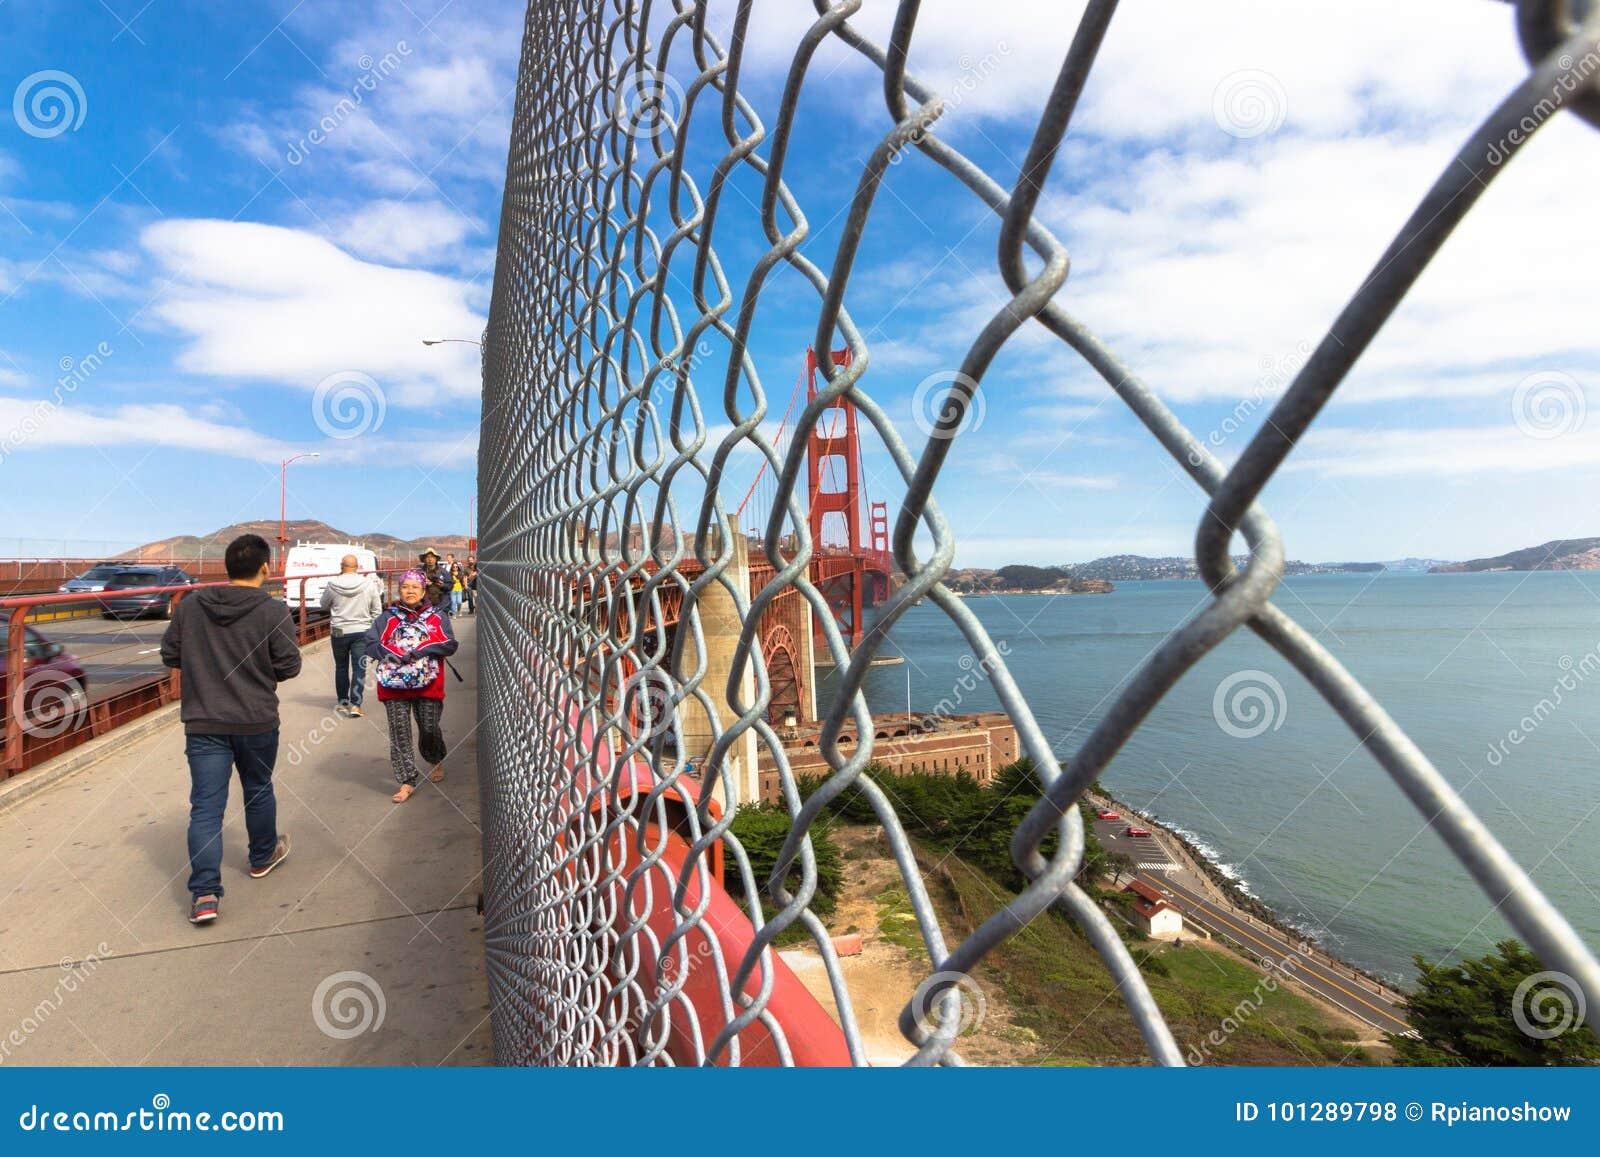 Sidewalk At The Golden Gate Bridge. Editorial Stock Photo - Image of ...